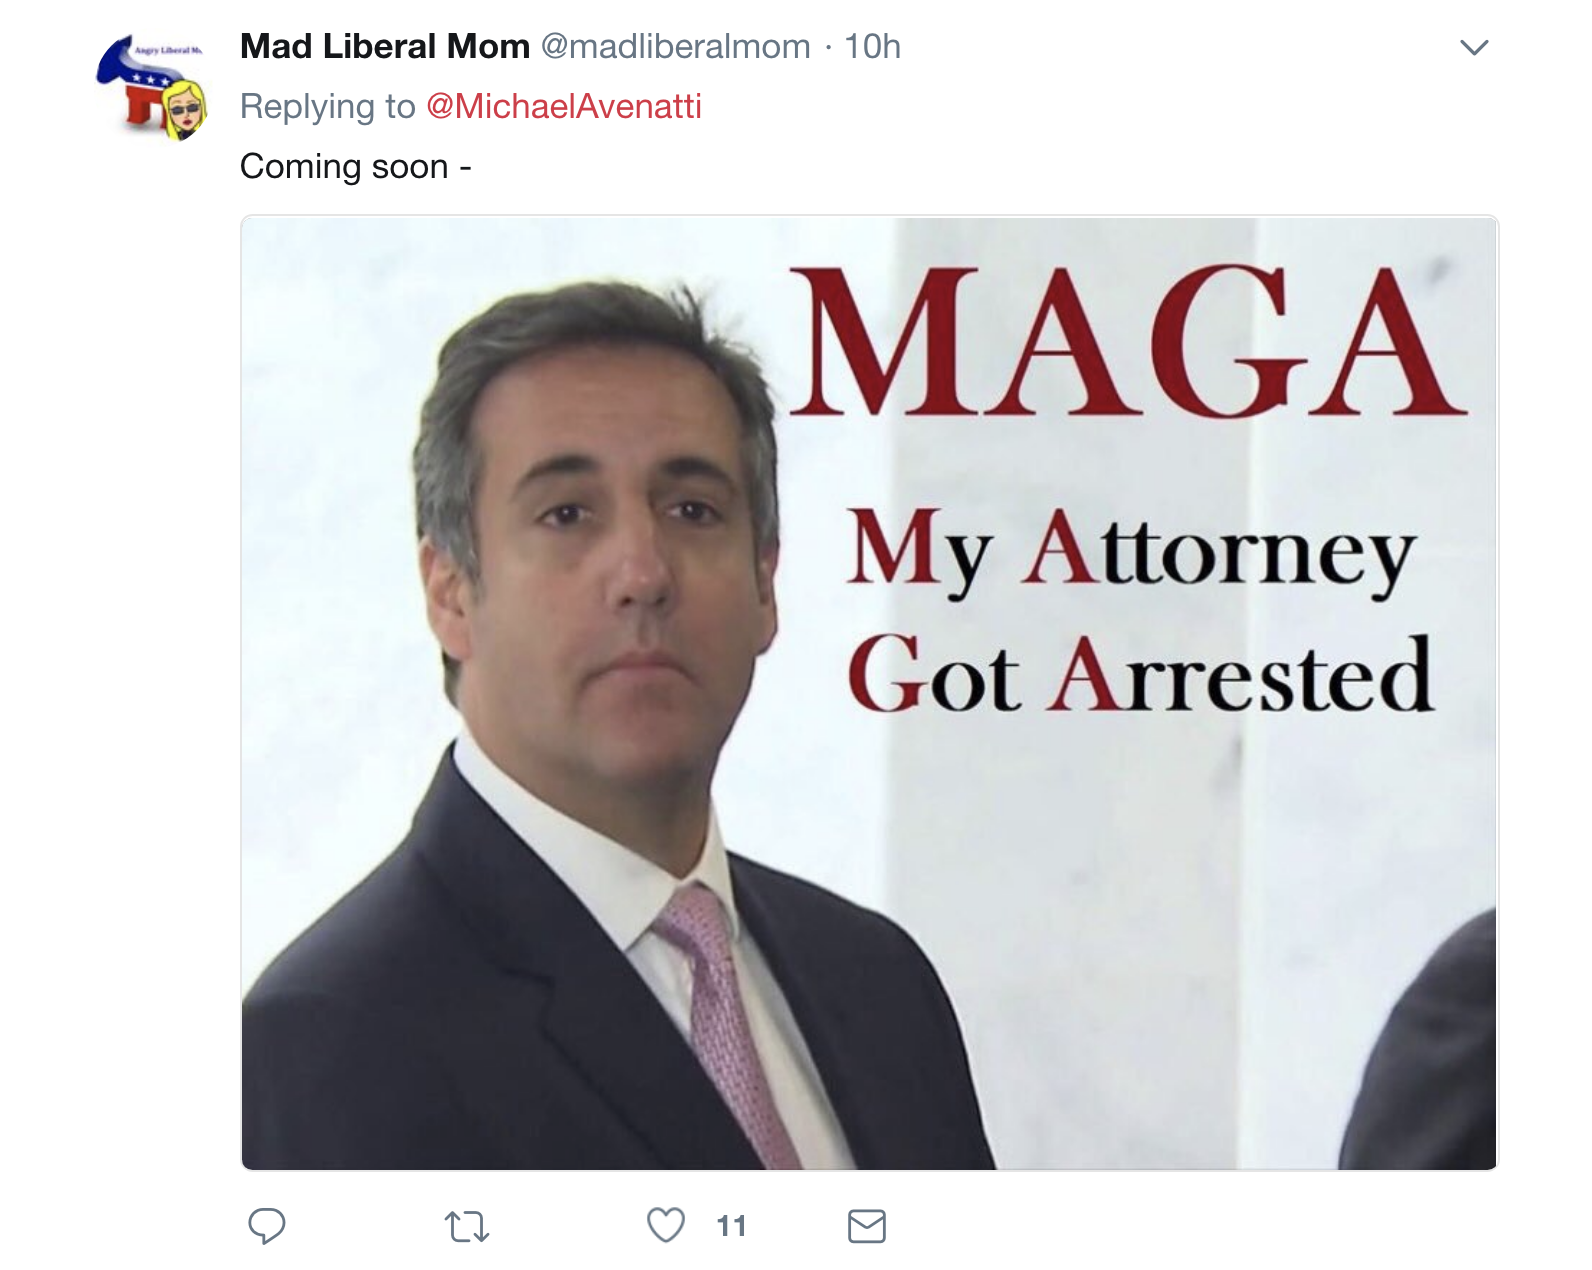 Screen-Shot-2018-04-10-at-11.01.13-AM Stormy Daniels' Attorney Responds To Trump's Arbitration Request Like A Badass Corruption Crime Donald Trump Politics Top Stories